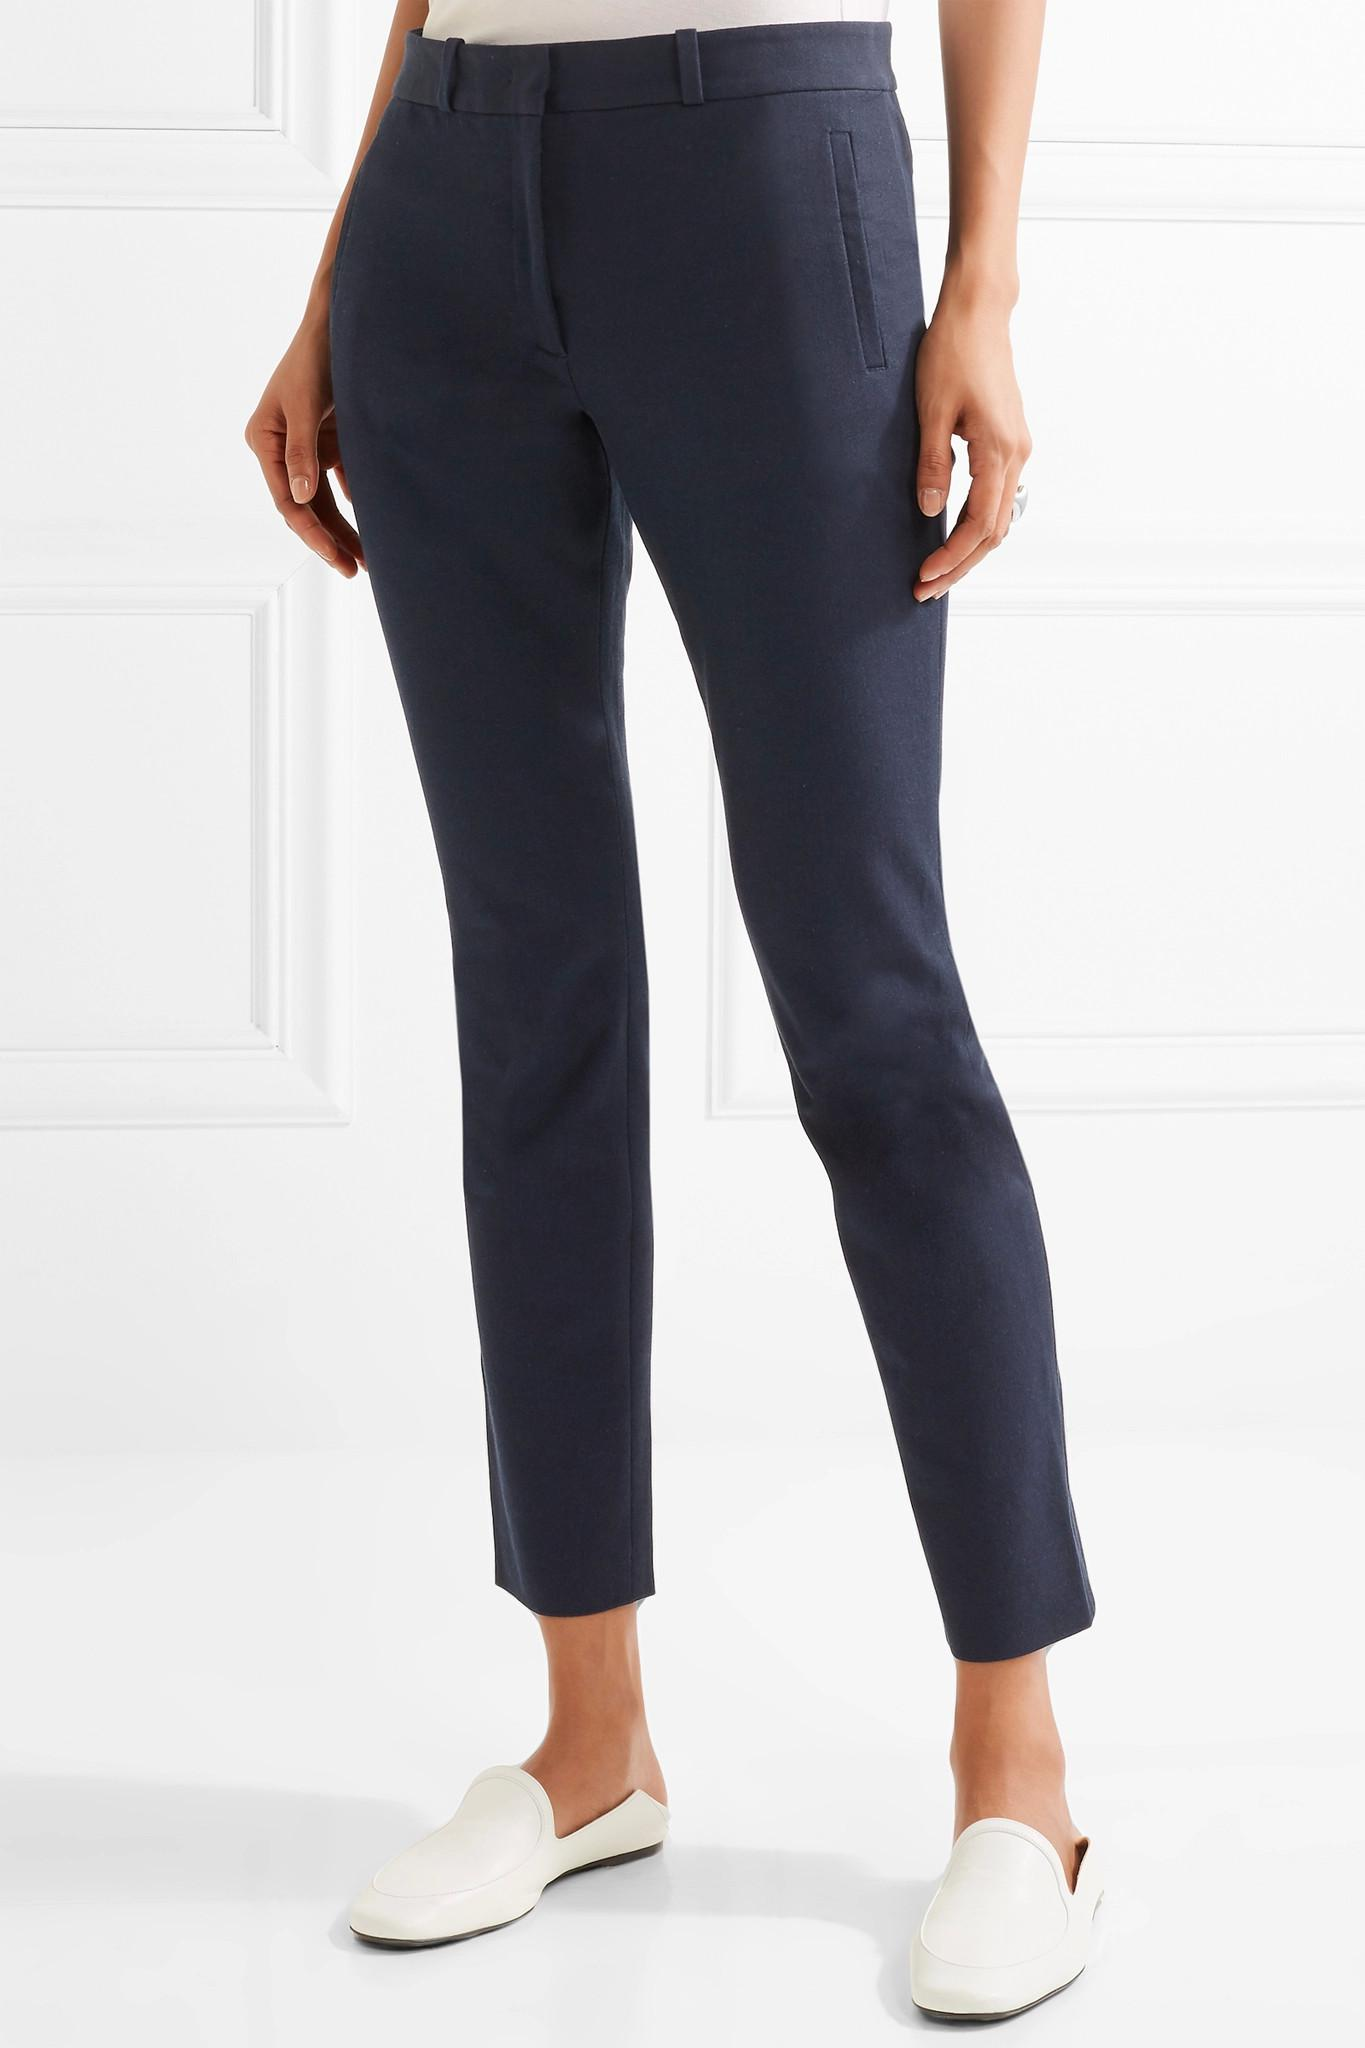 New Eliston skinny pants Joseph 7D4L7Ys